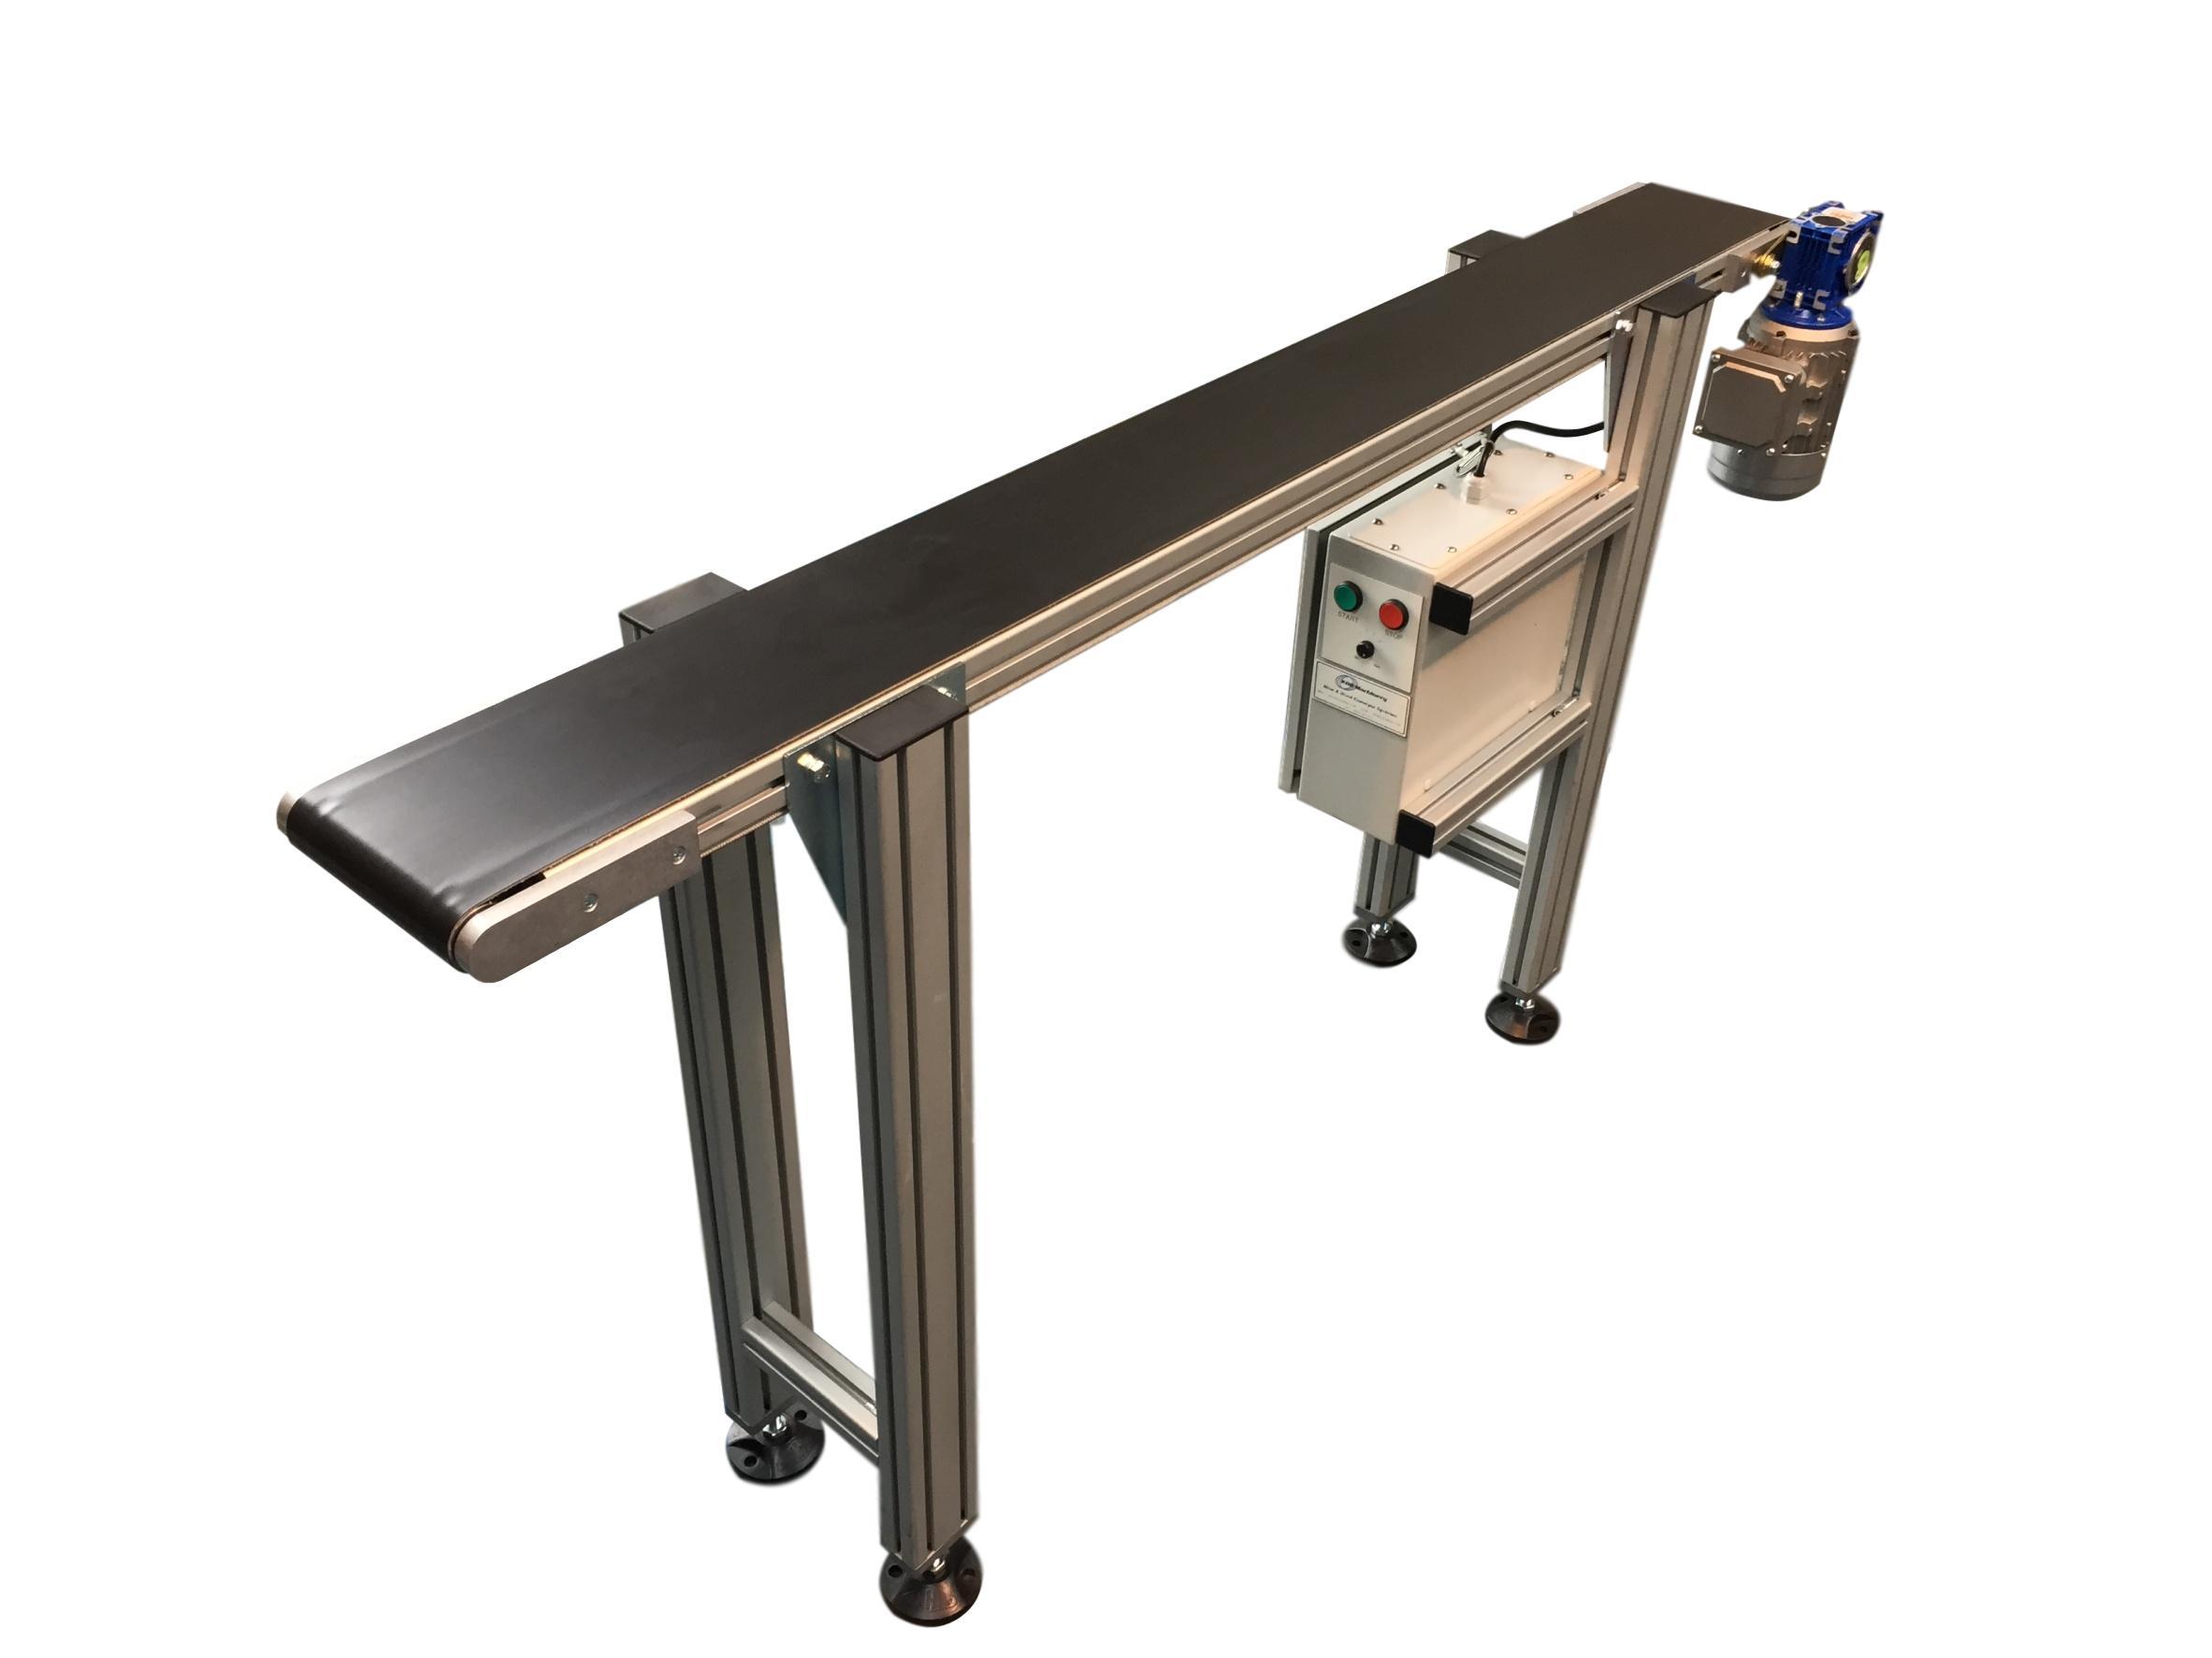 light duty belt conveyor small conveyor small belt conveyors micro conveyors